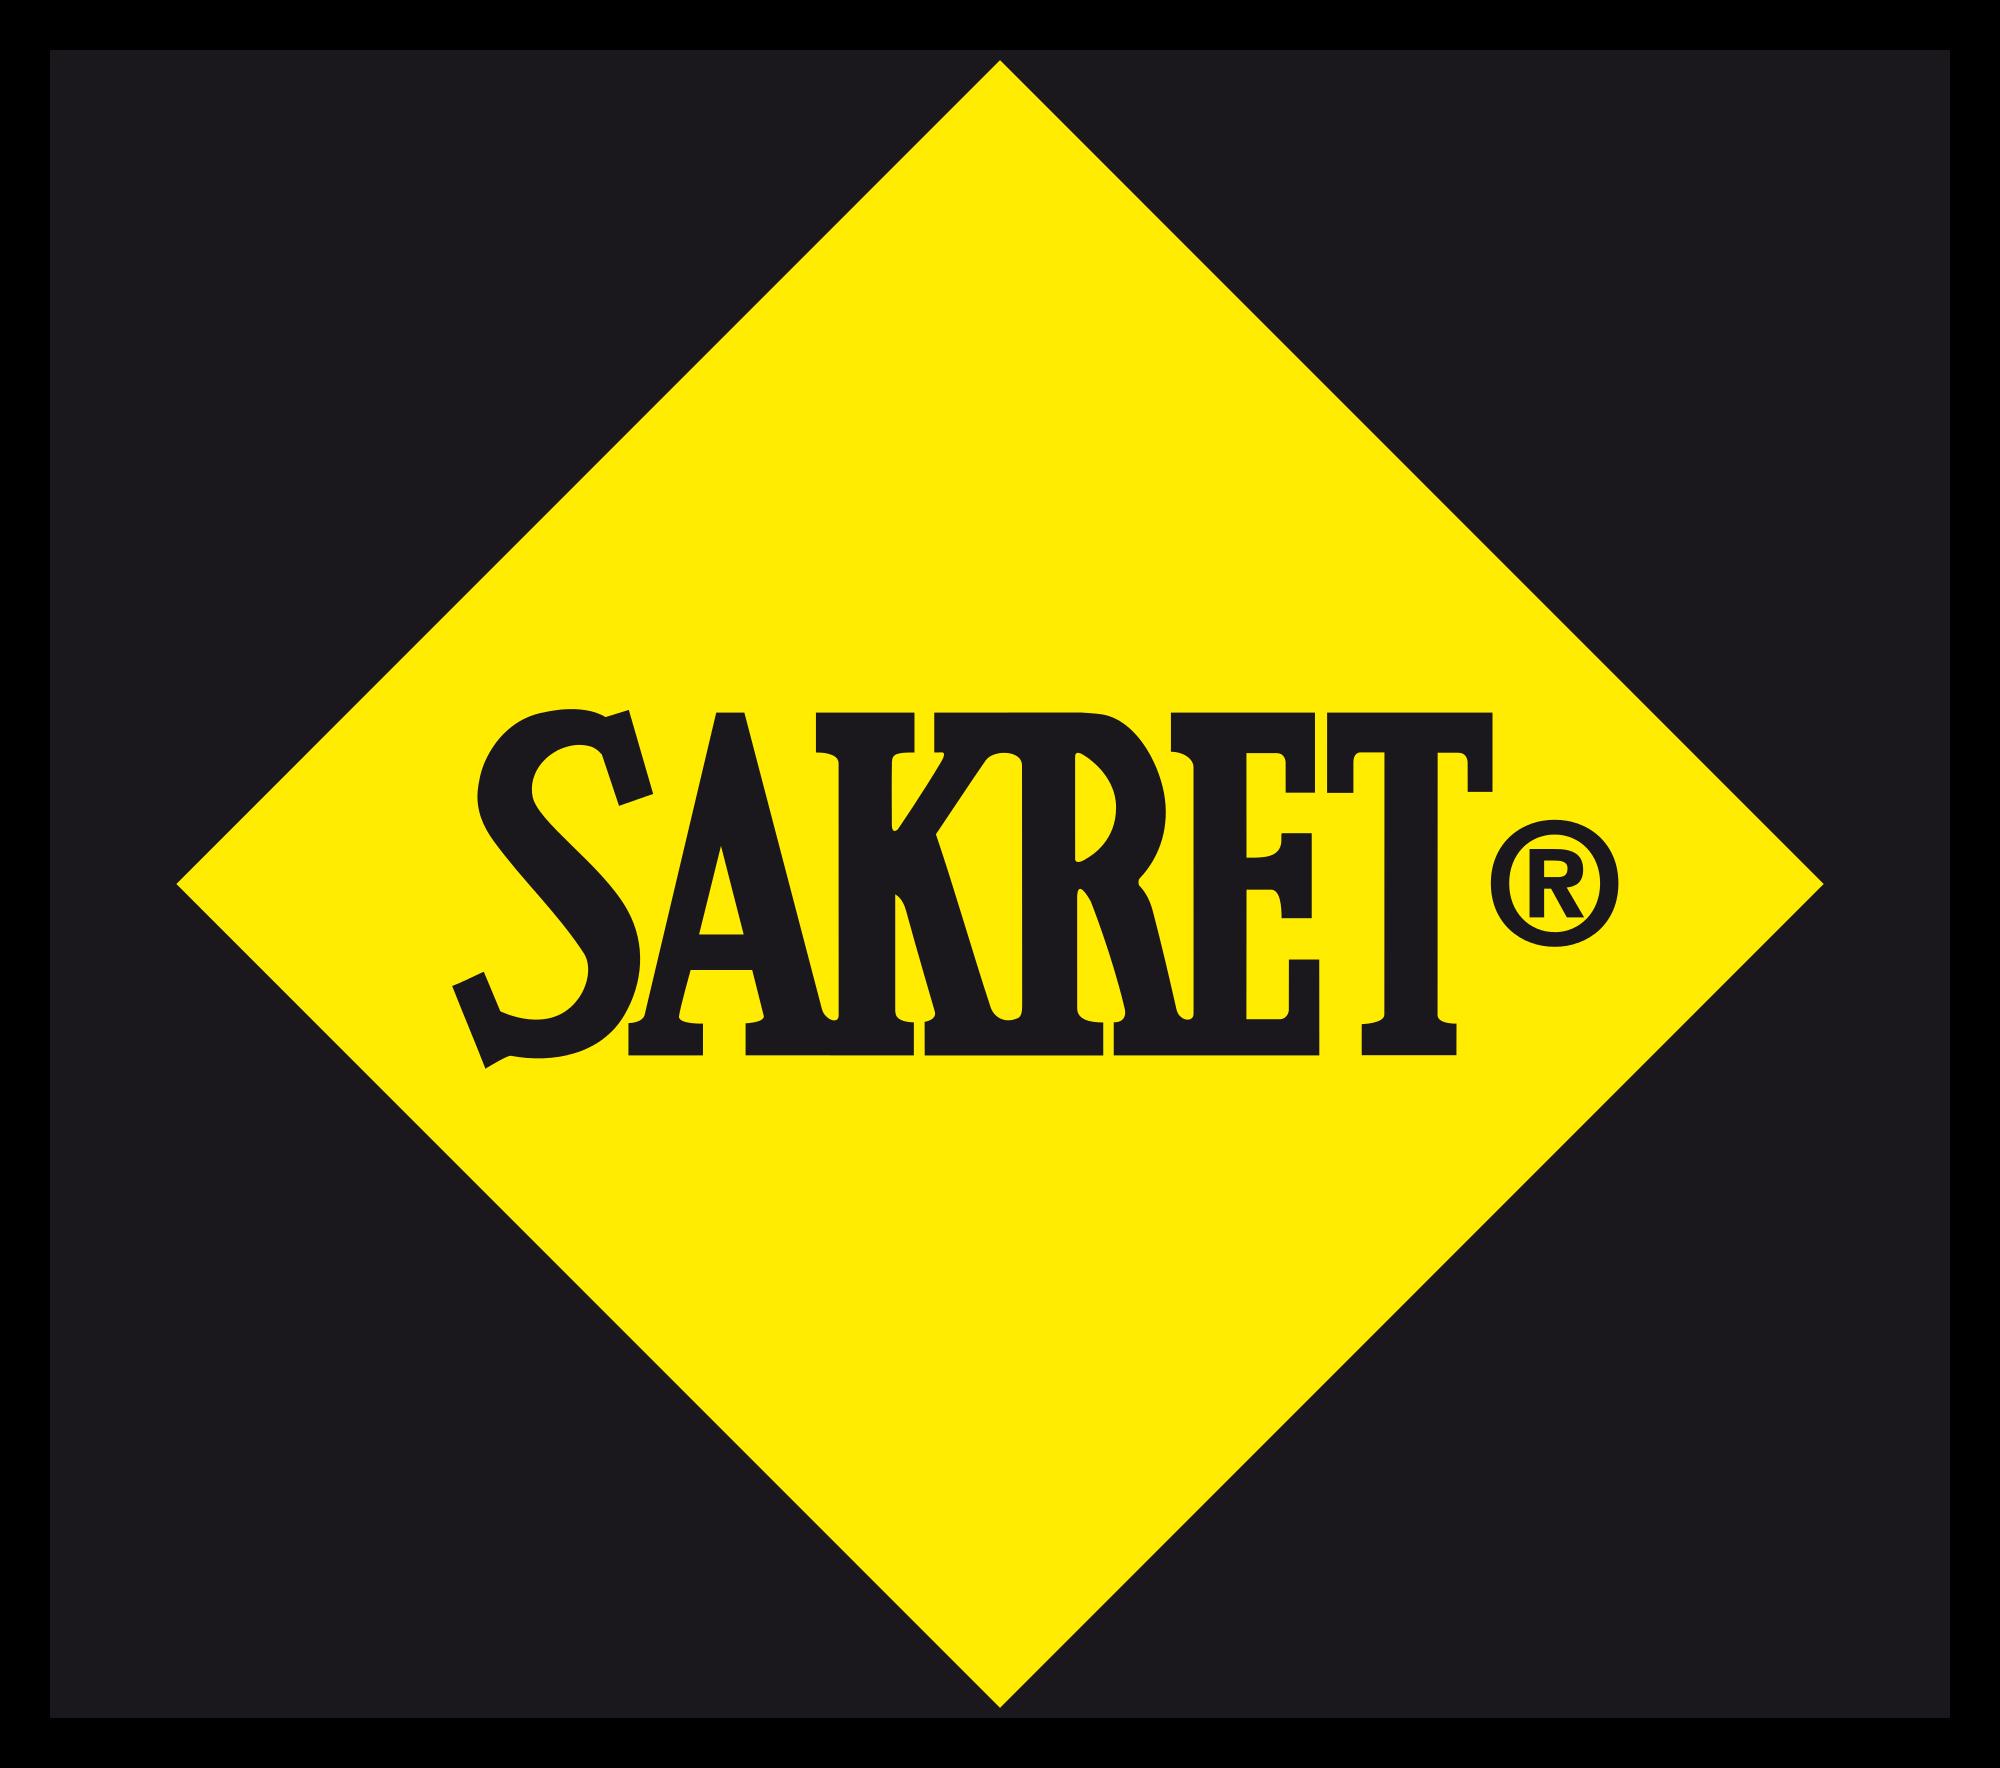 Logo des Unternehmens Sakret